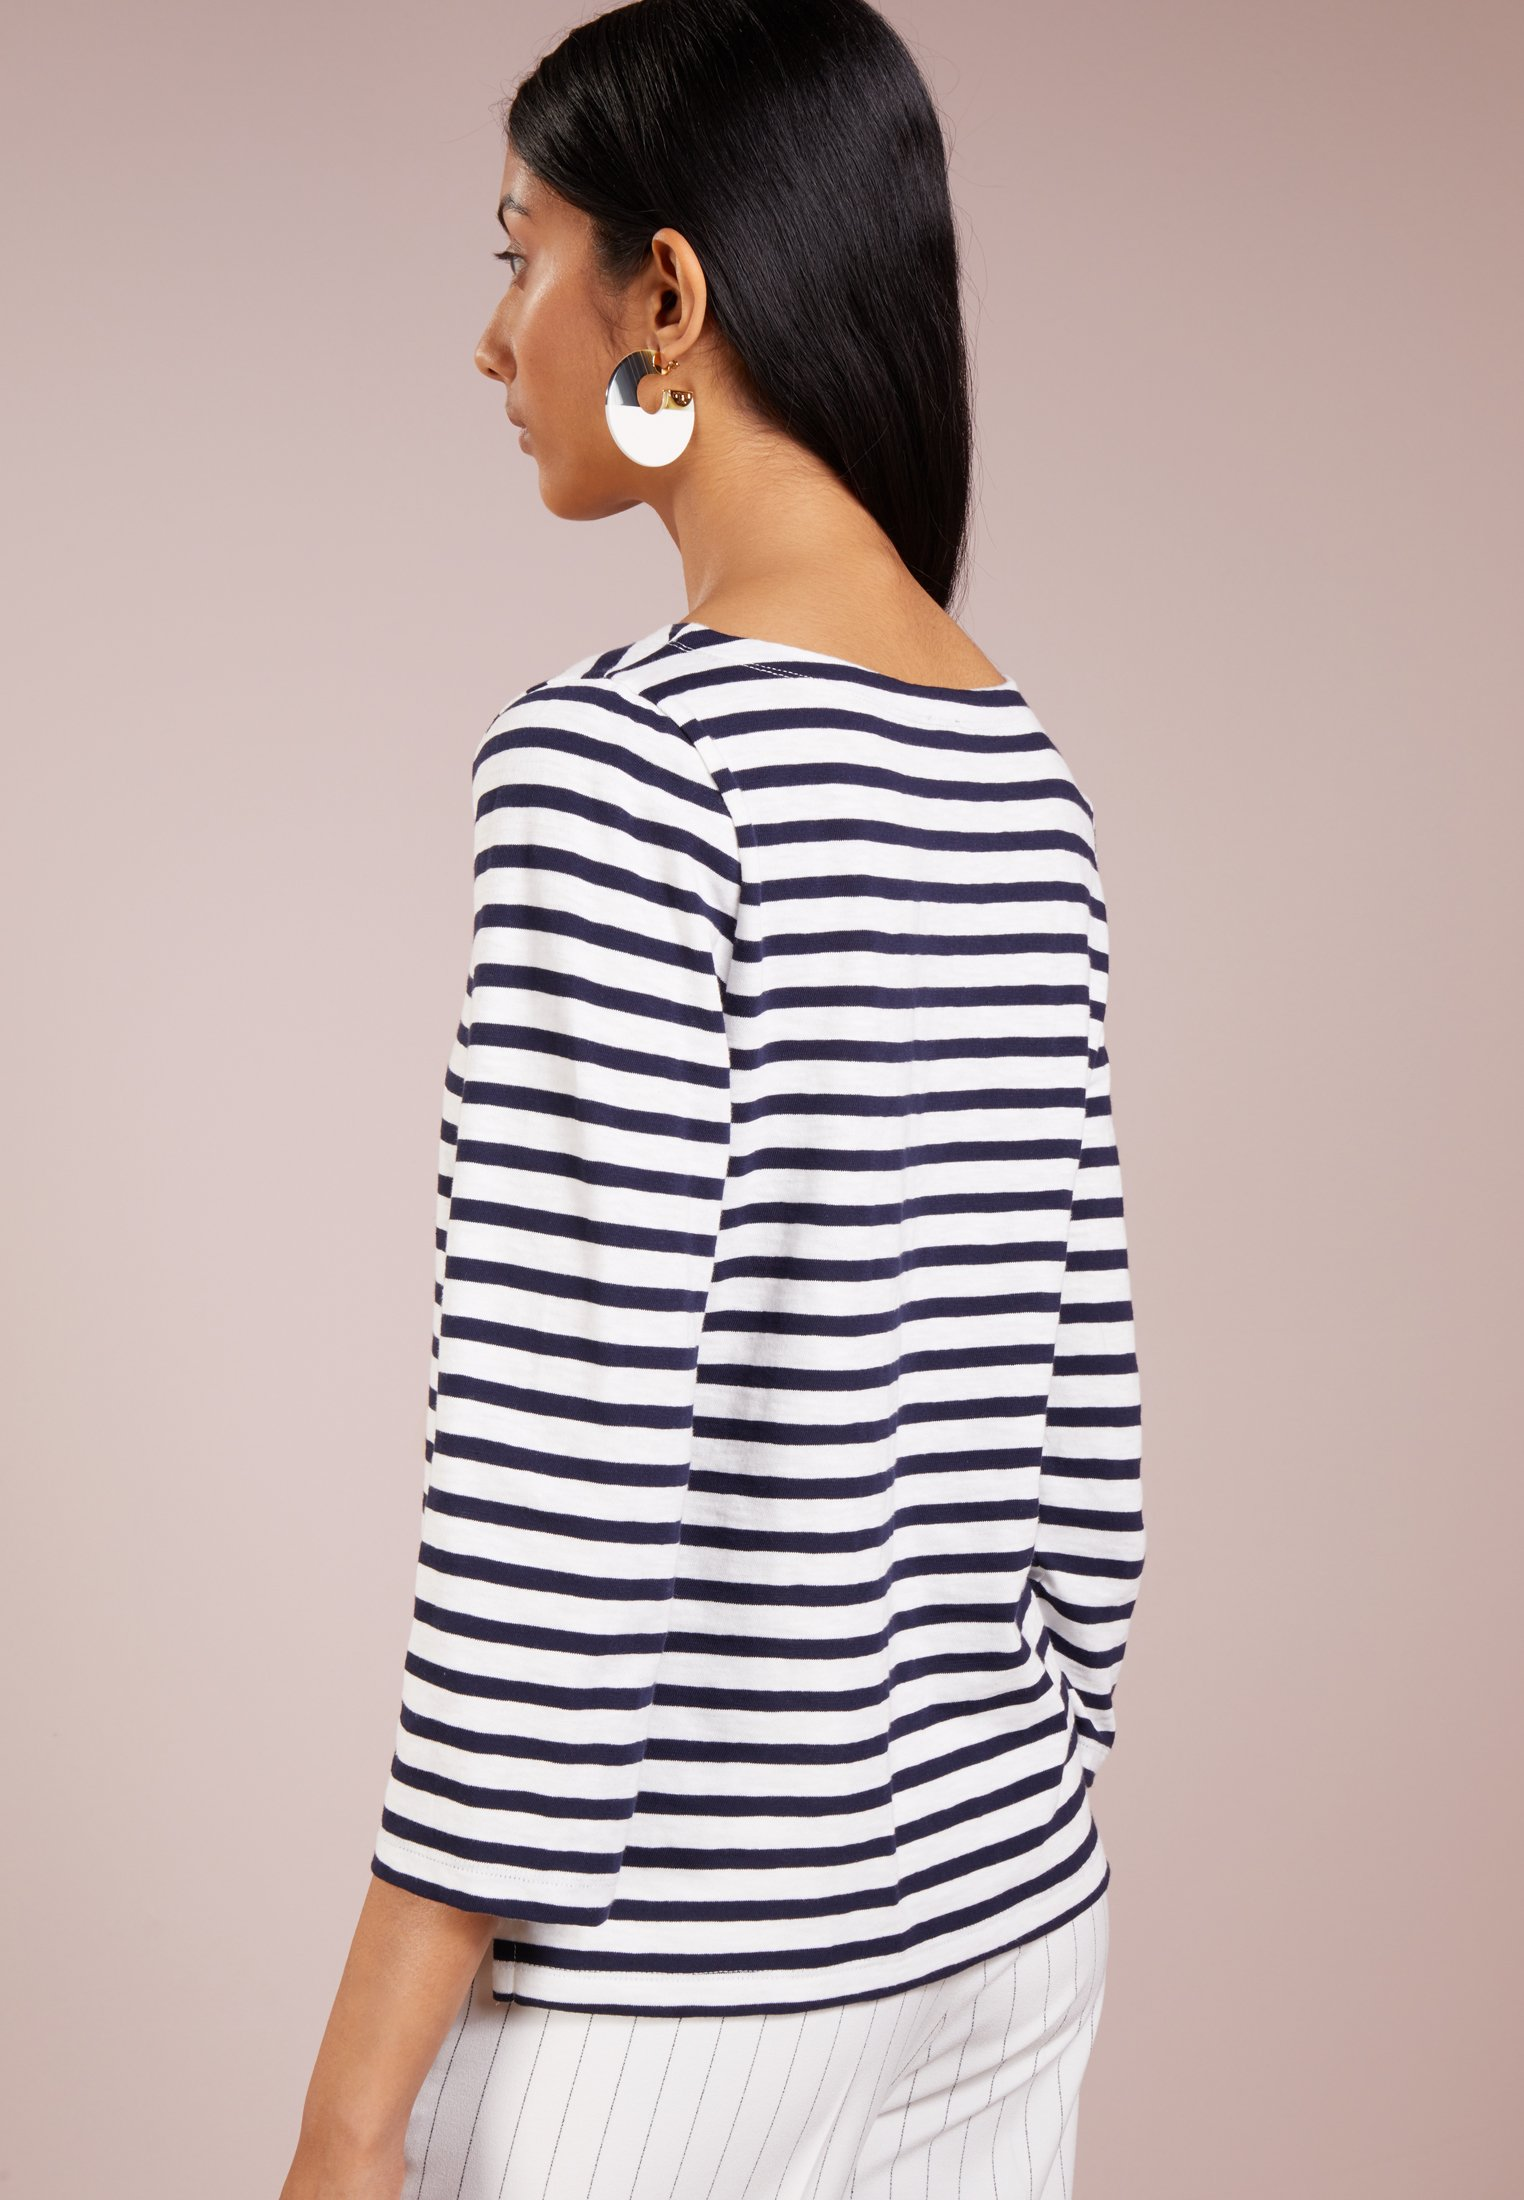 J.CREW T-shirt à manches longues - ivory/navy - Tops & T-shirts Femme 6fvLr